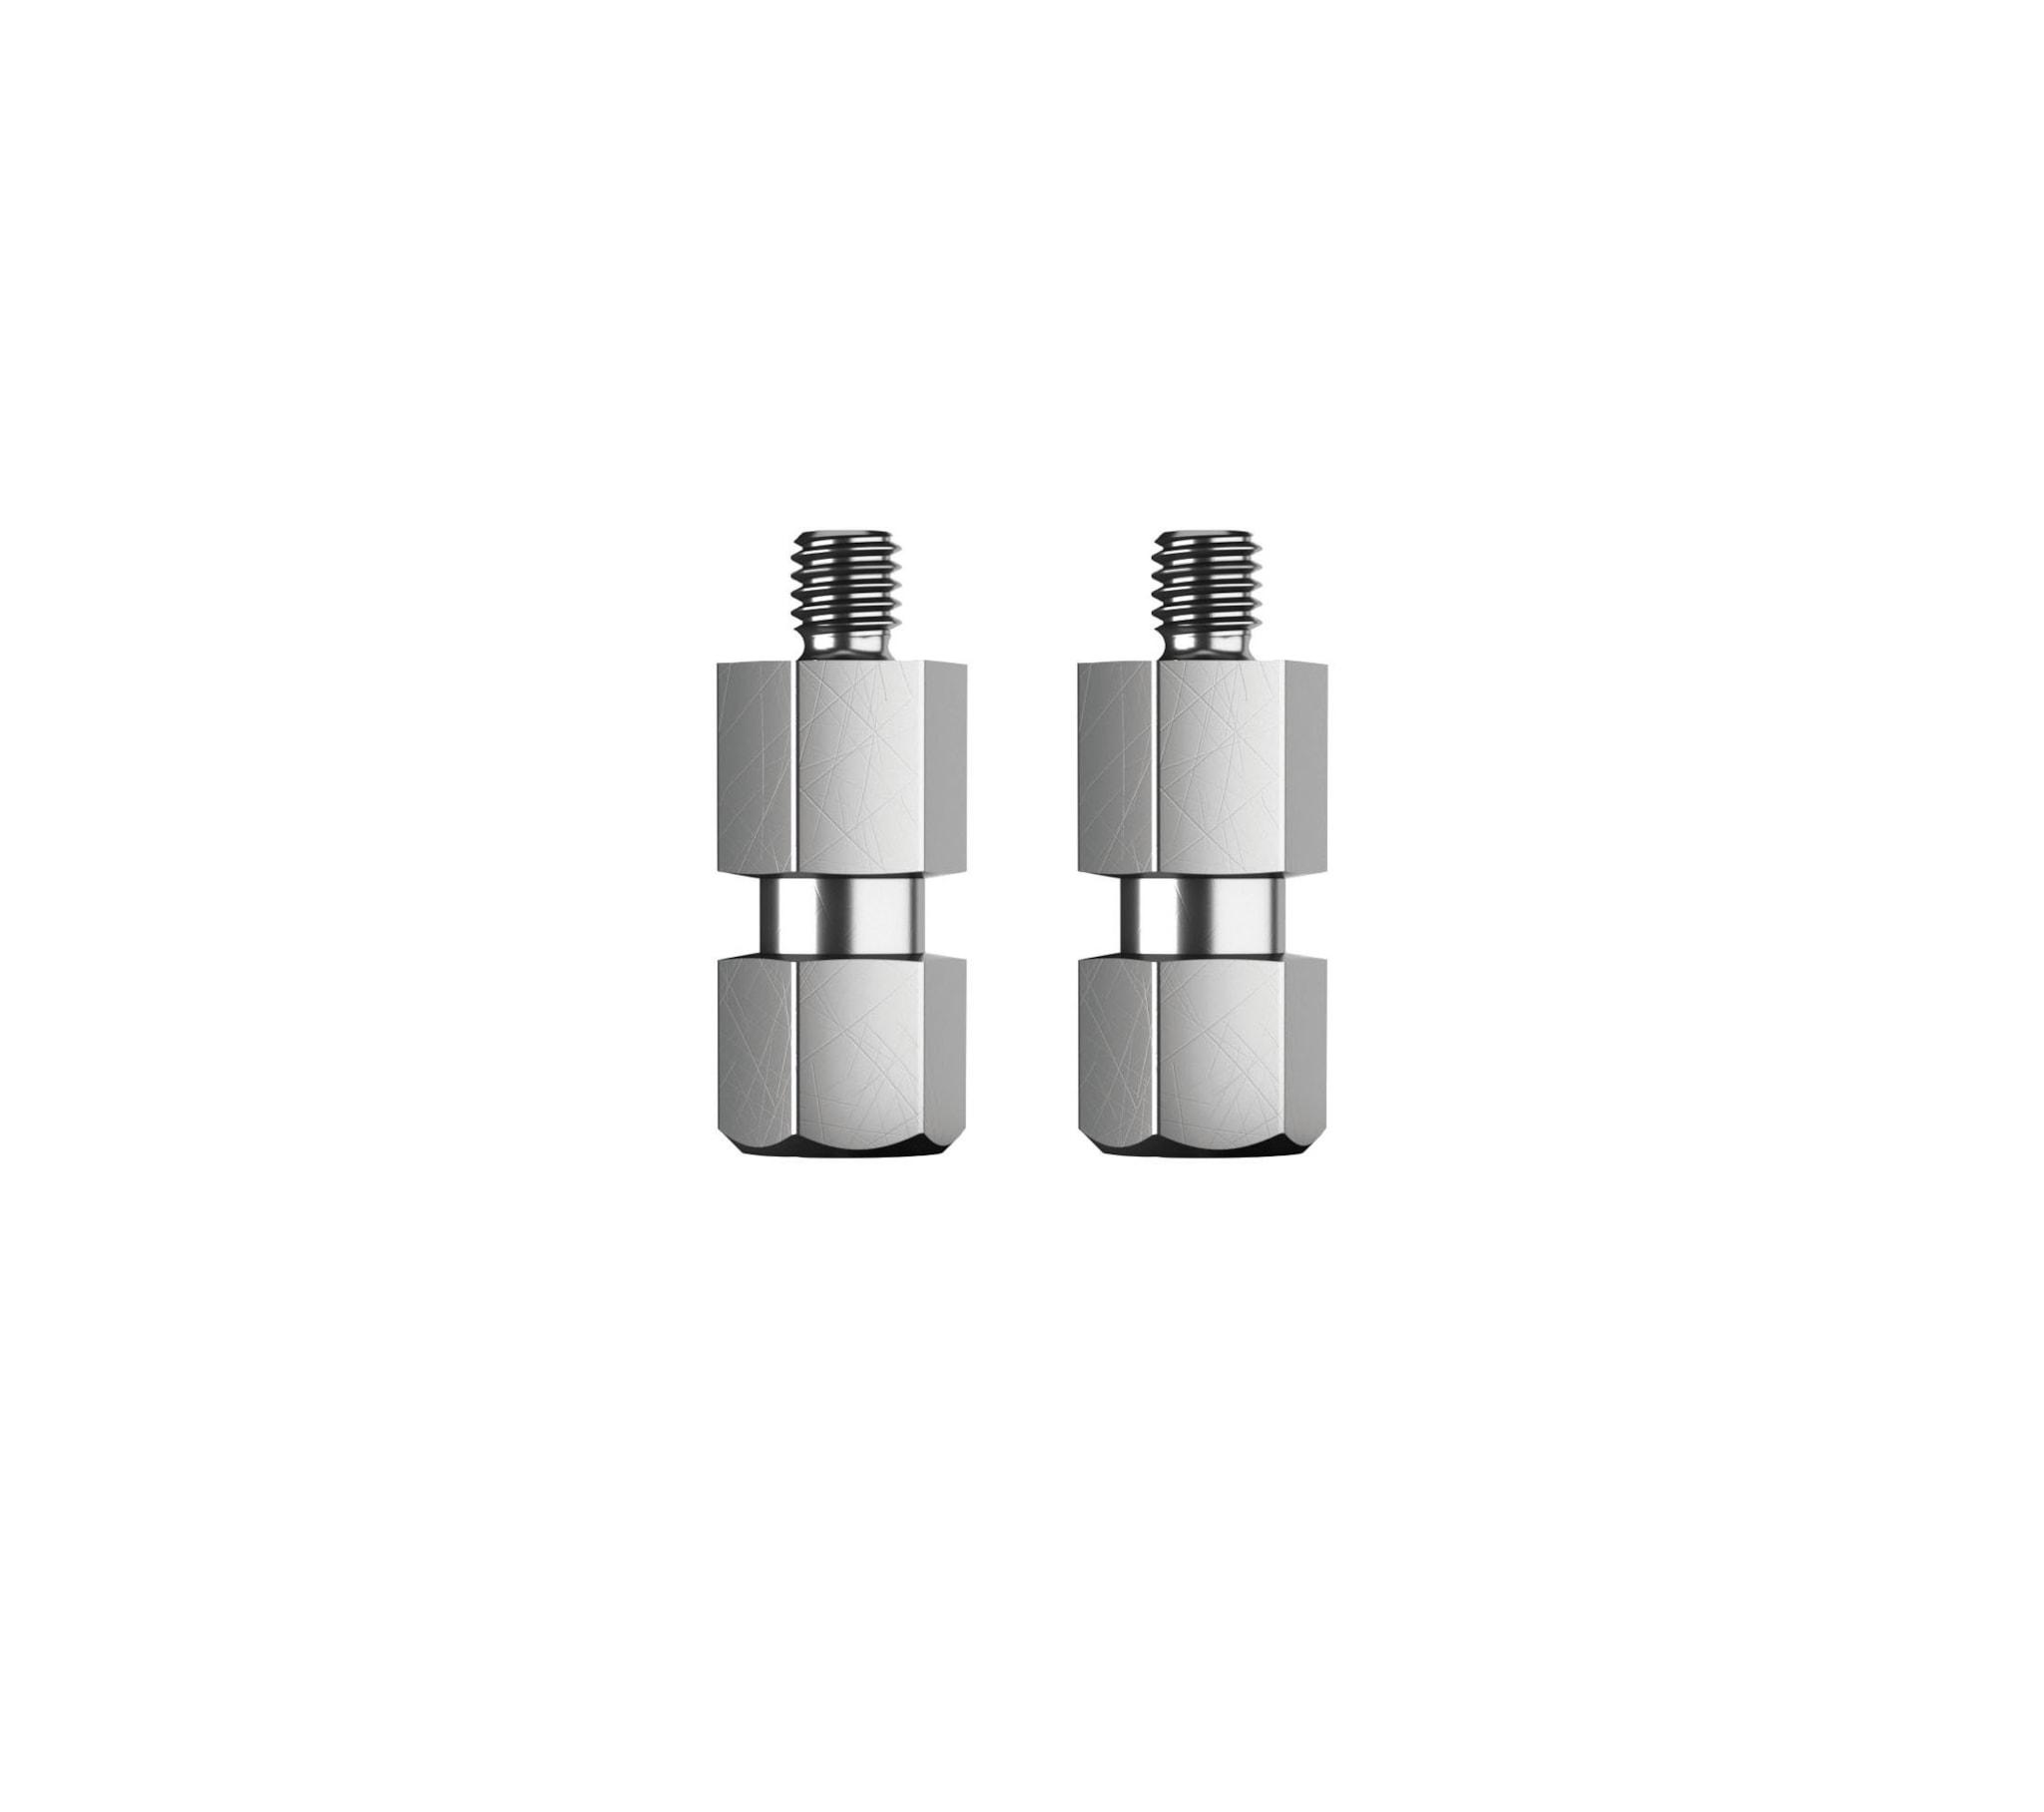 KM23903 - Threaded bolt